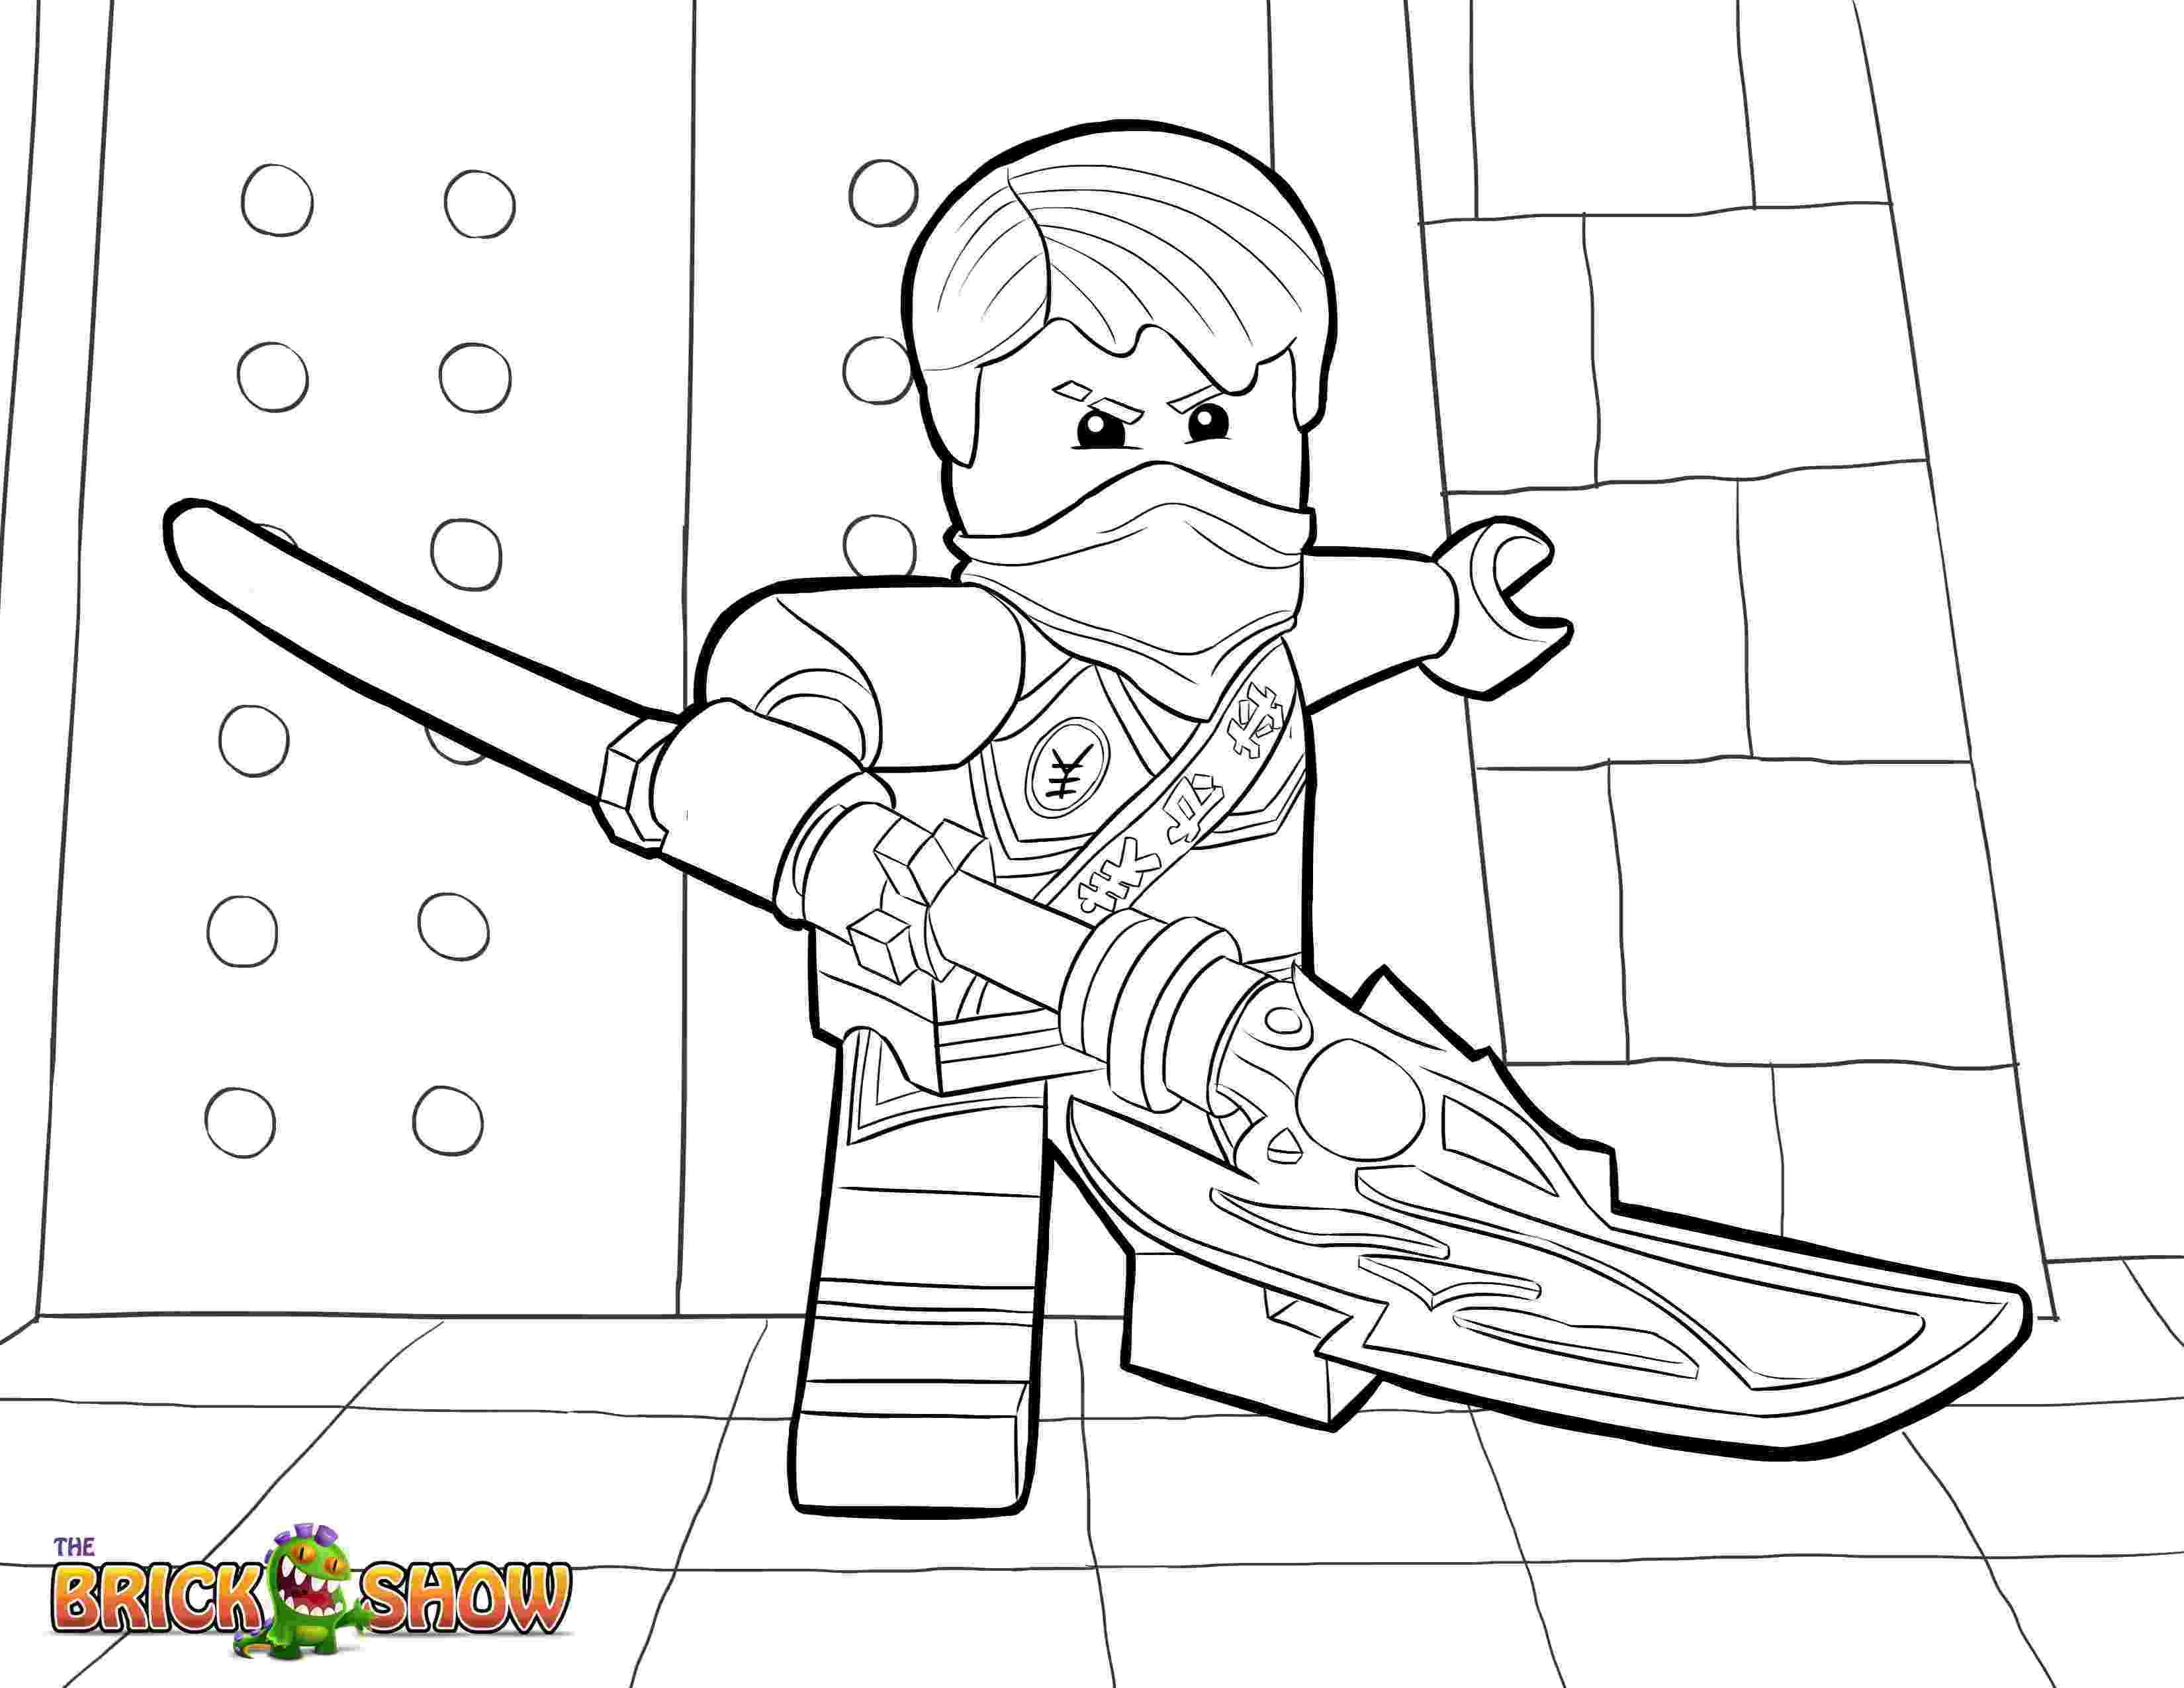 ninjago coloring pages jay lego ninjago ninja jay free coloring pages ninjago pages coloring jay